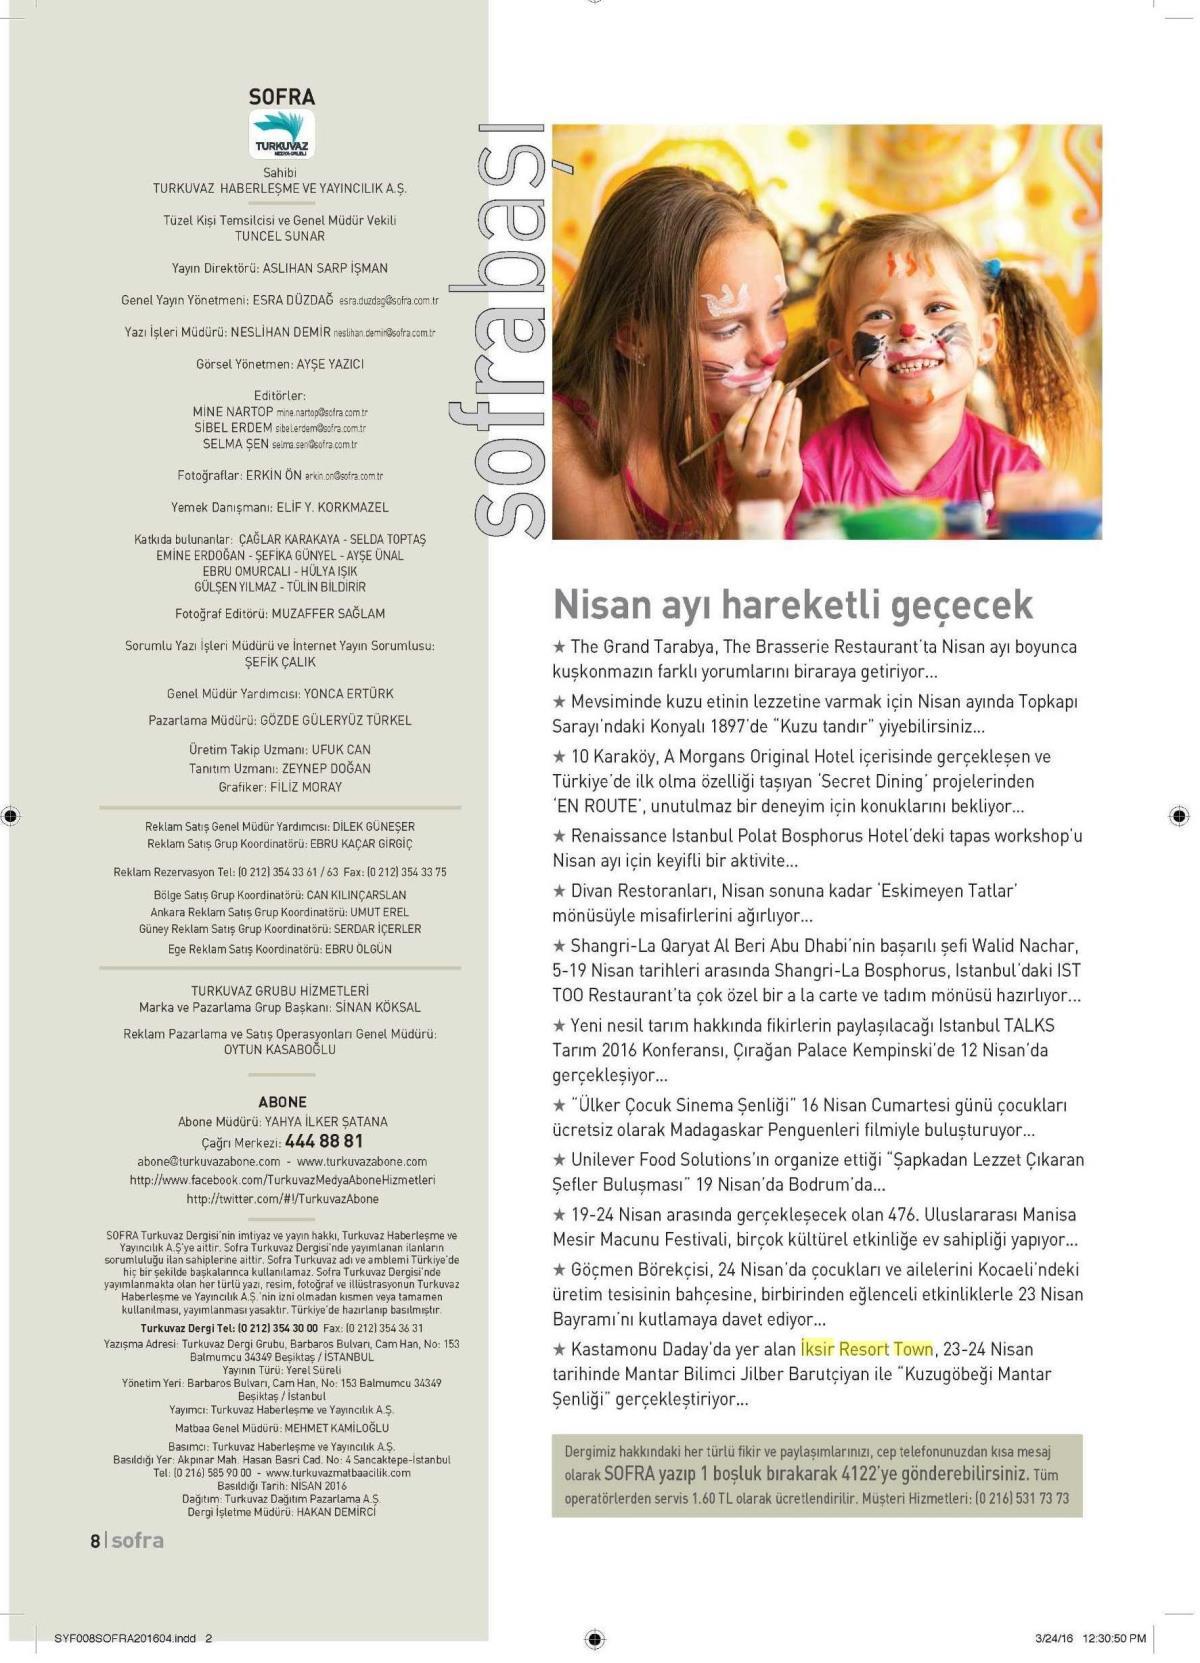 Sofra Dergisi - Nisan 2016